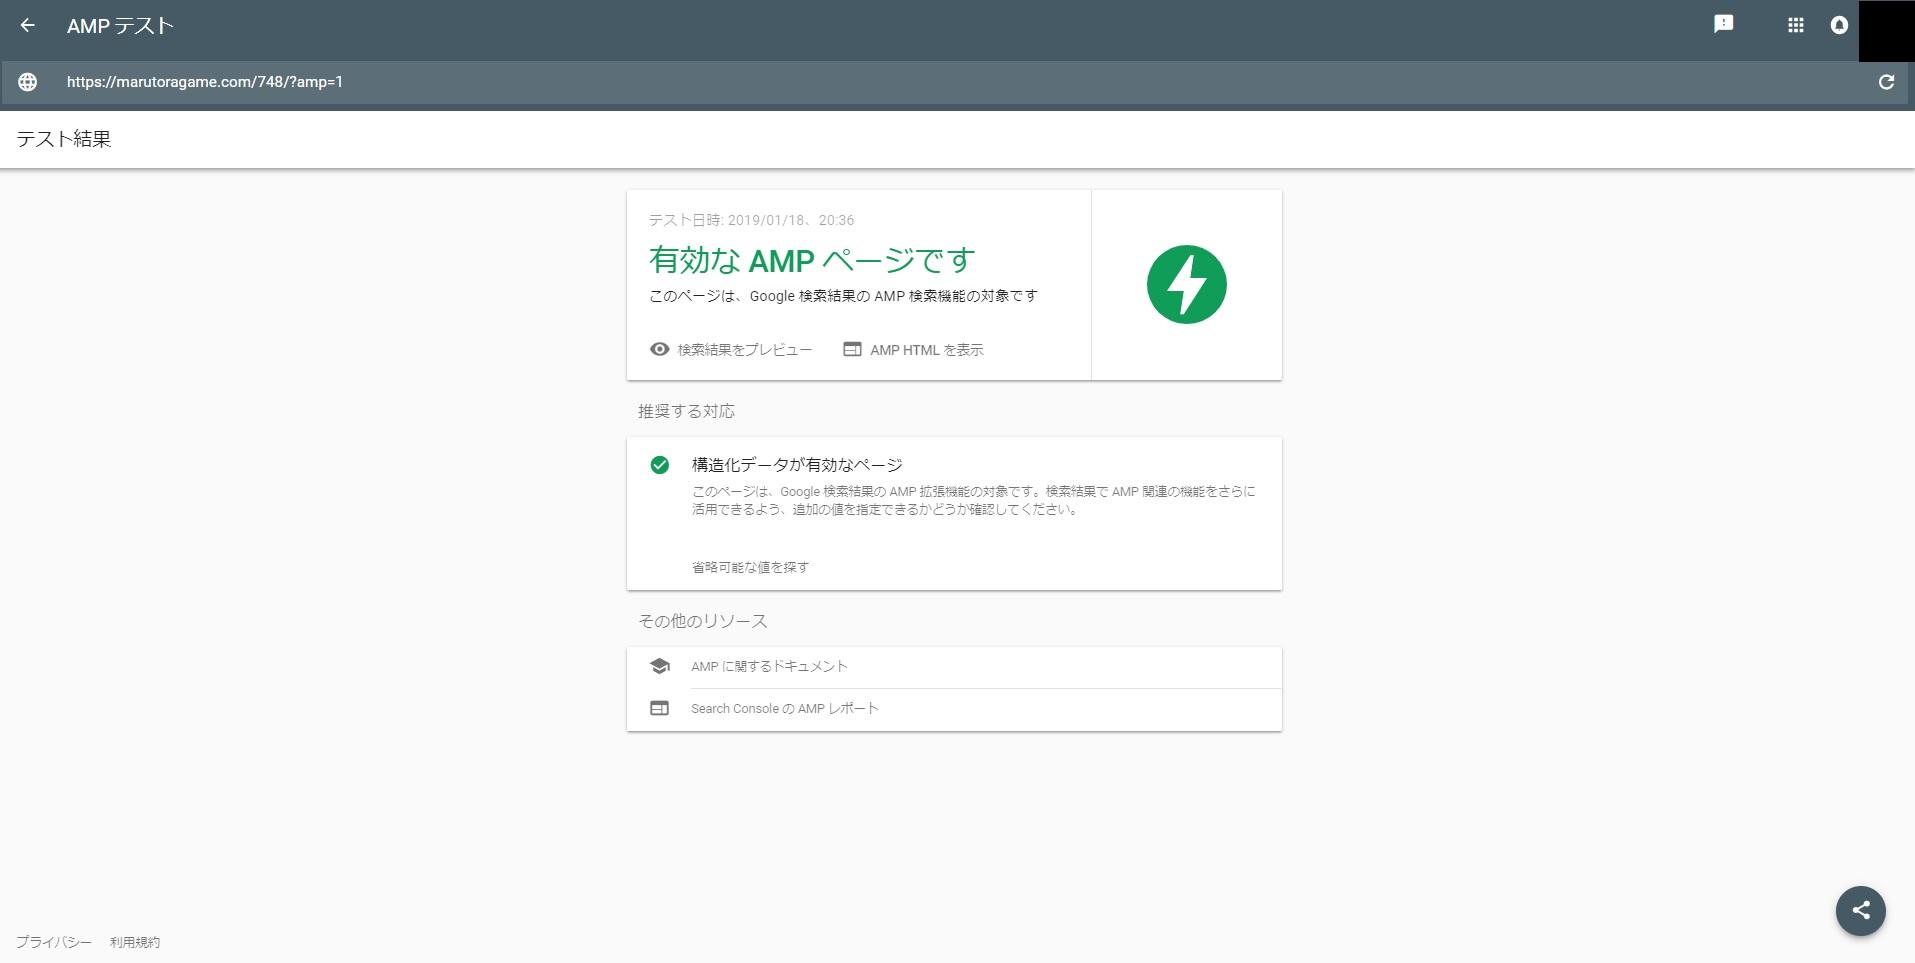 AMPページの確認結果画面